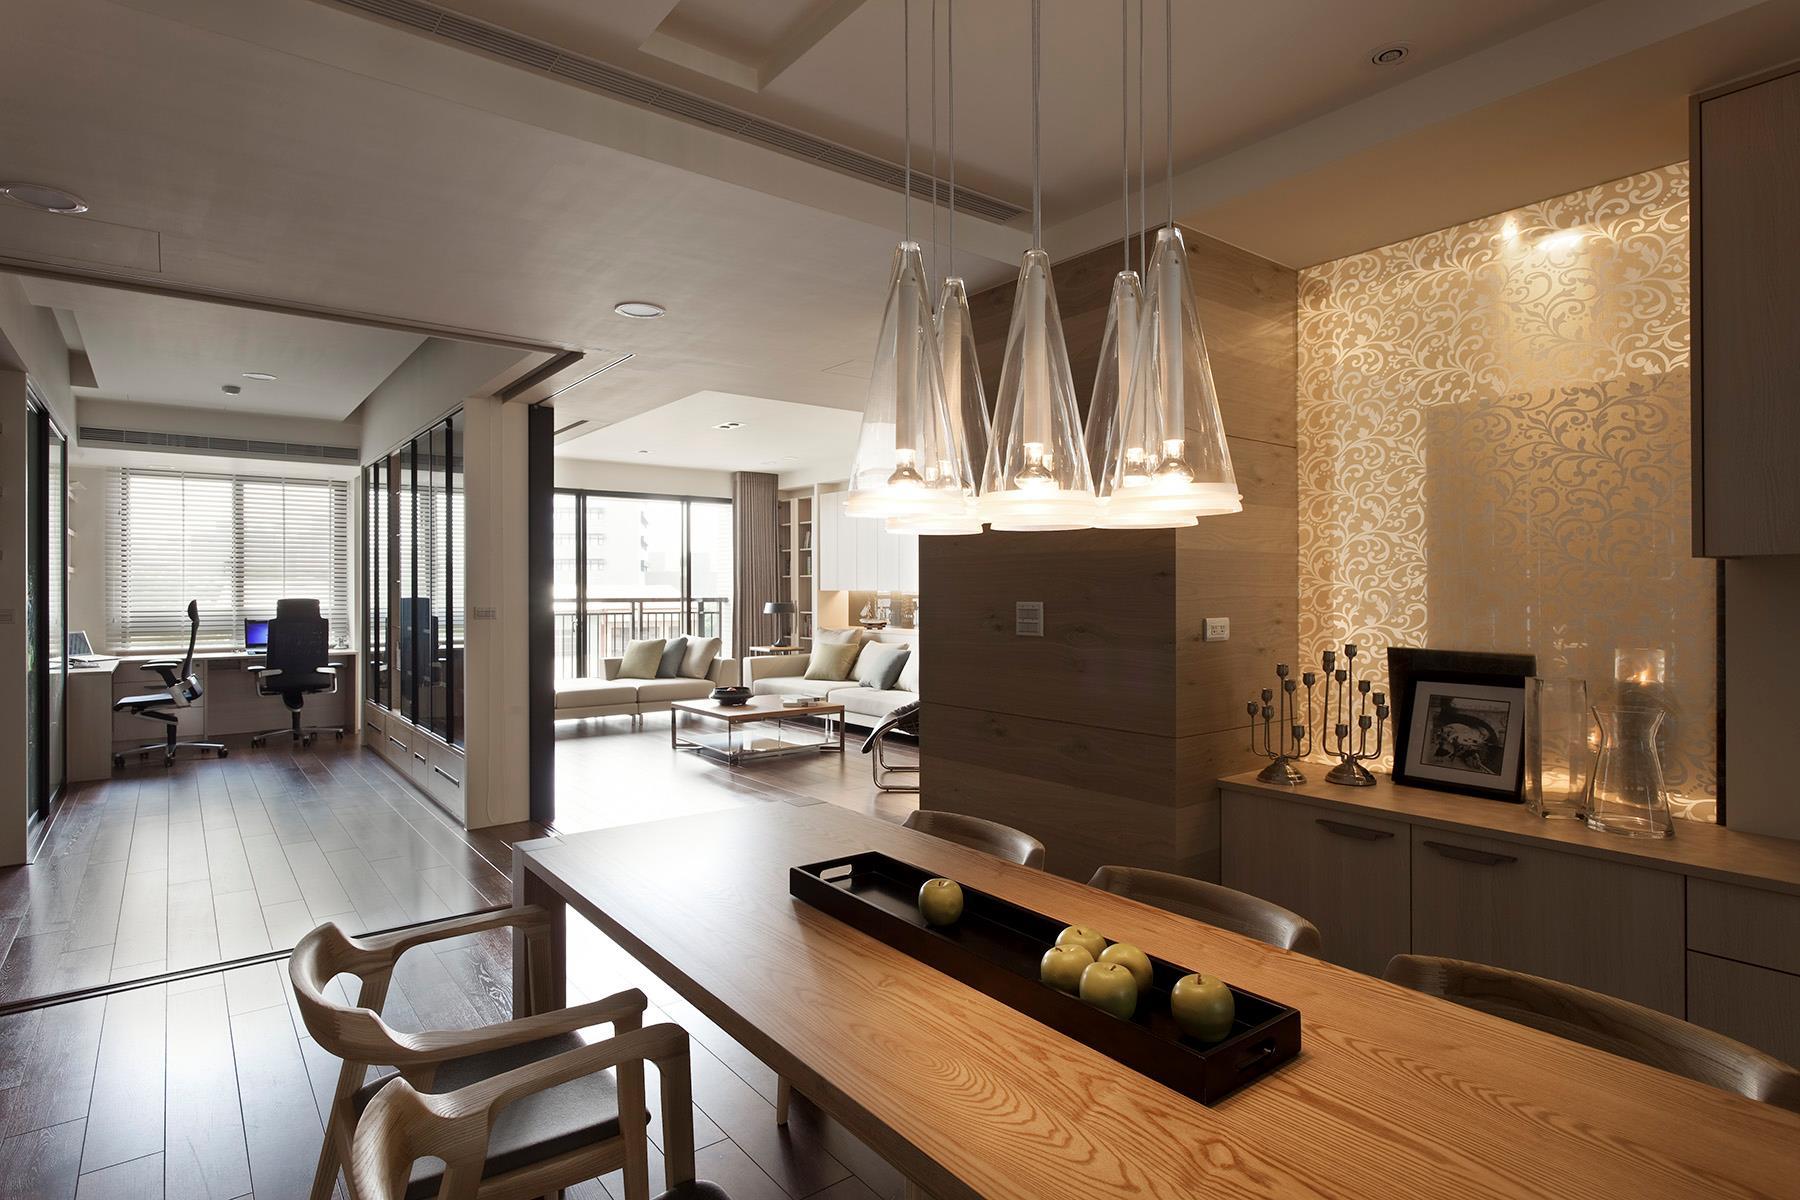 architecture interior design follow small open plan kitchen living room design ideas